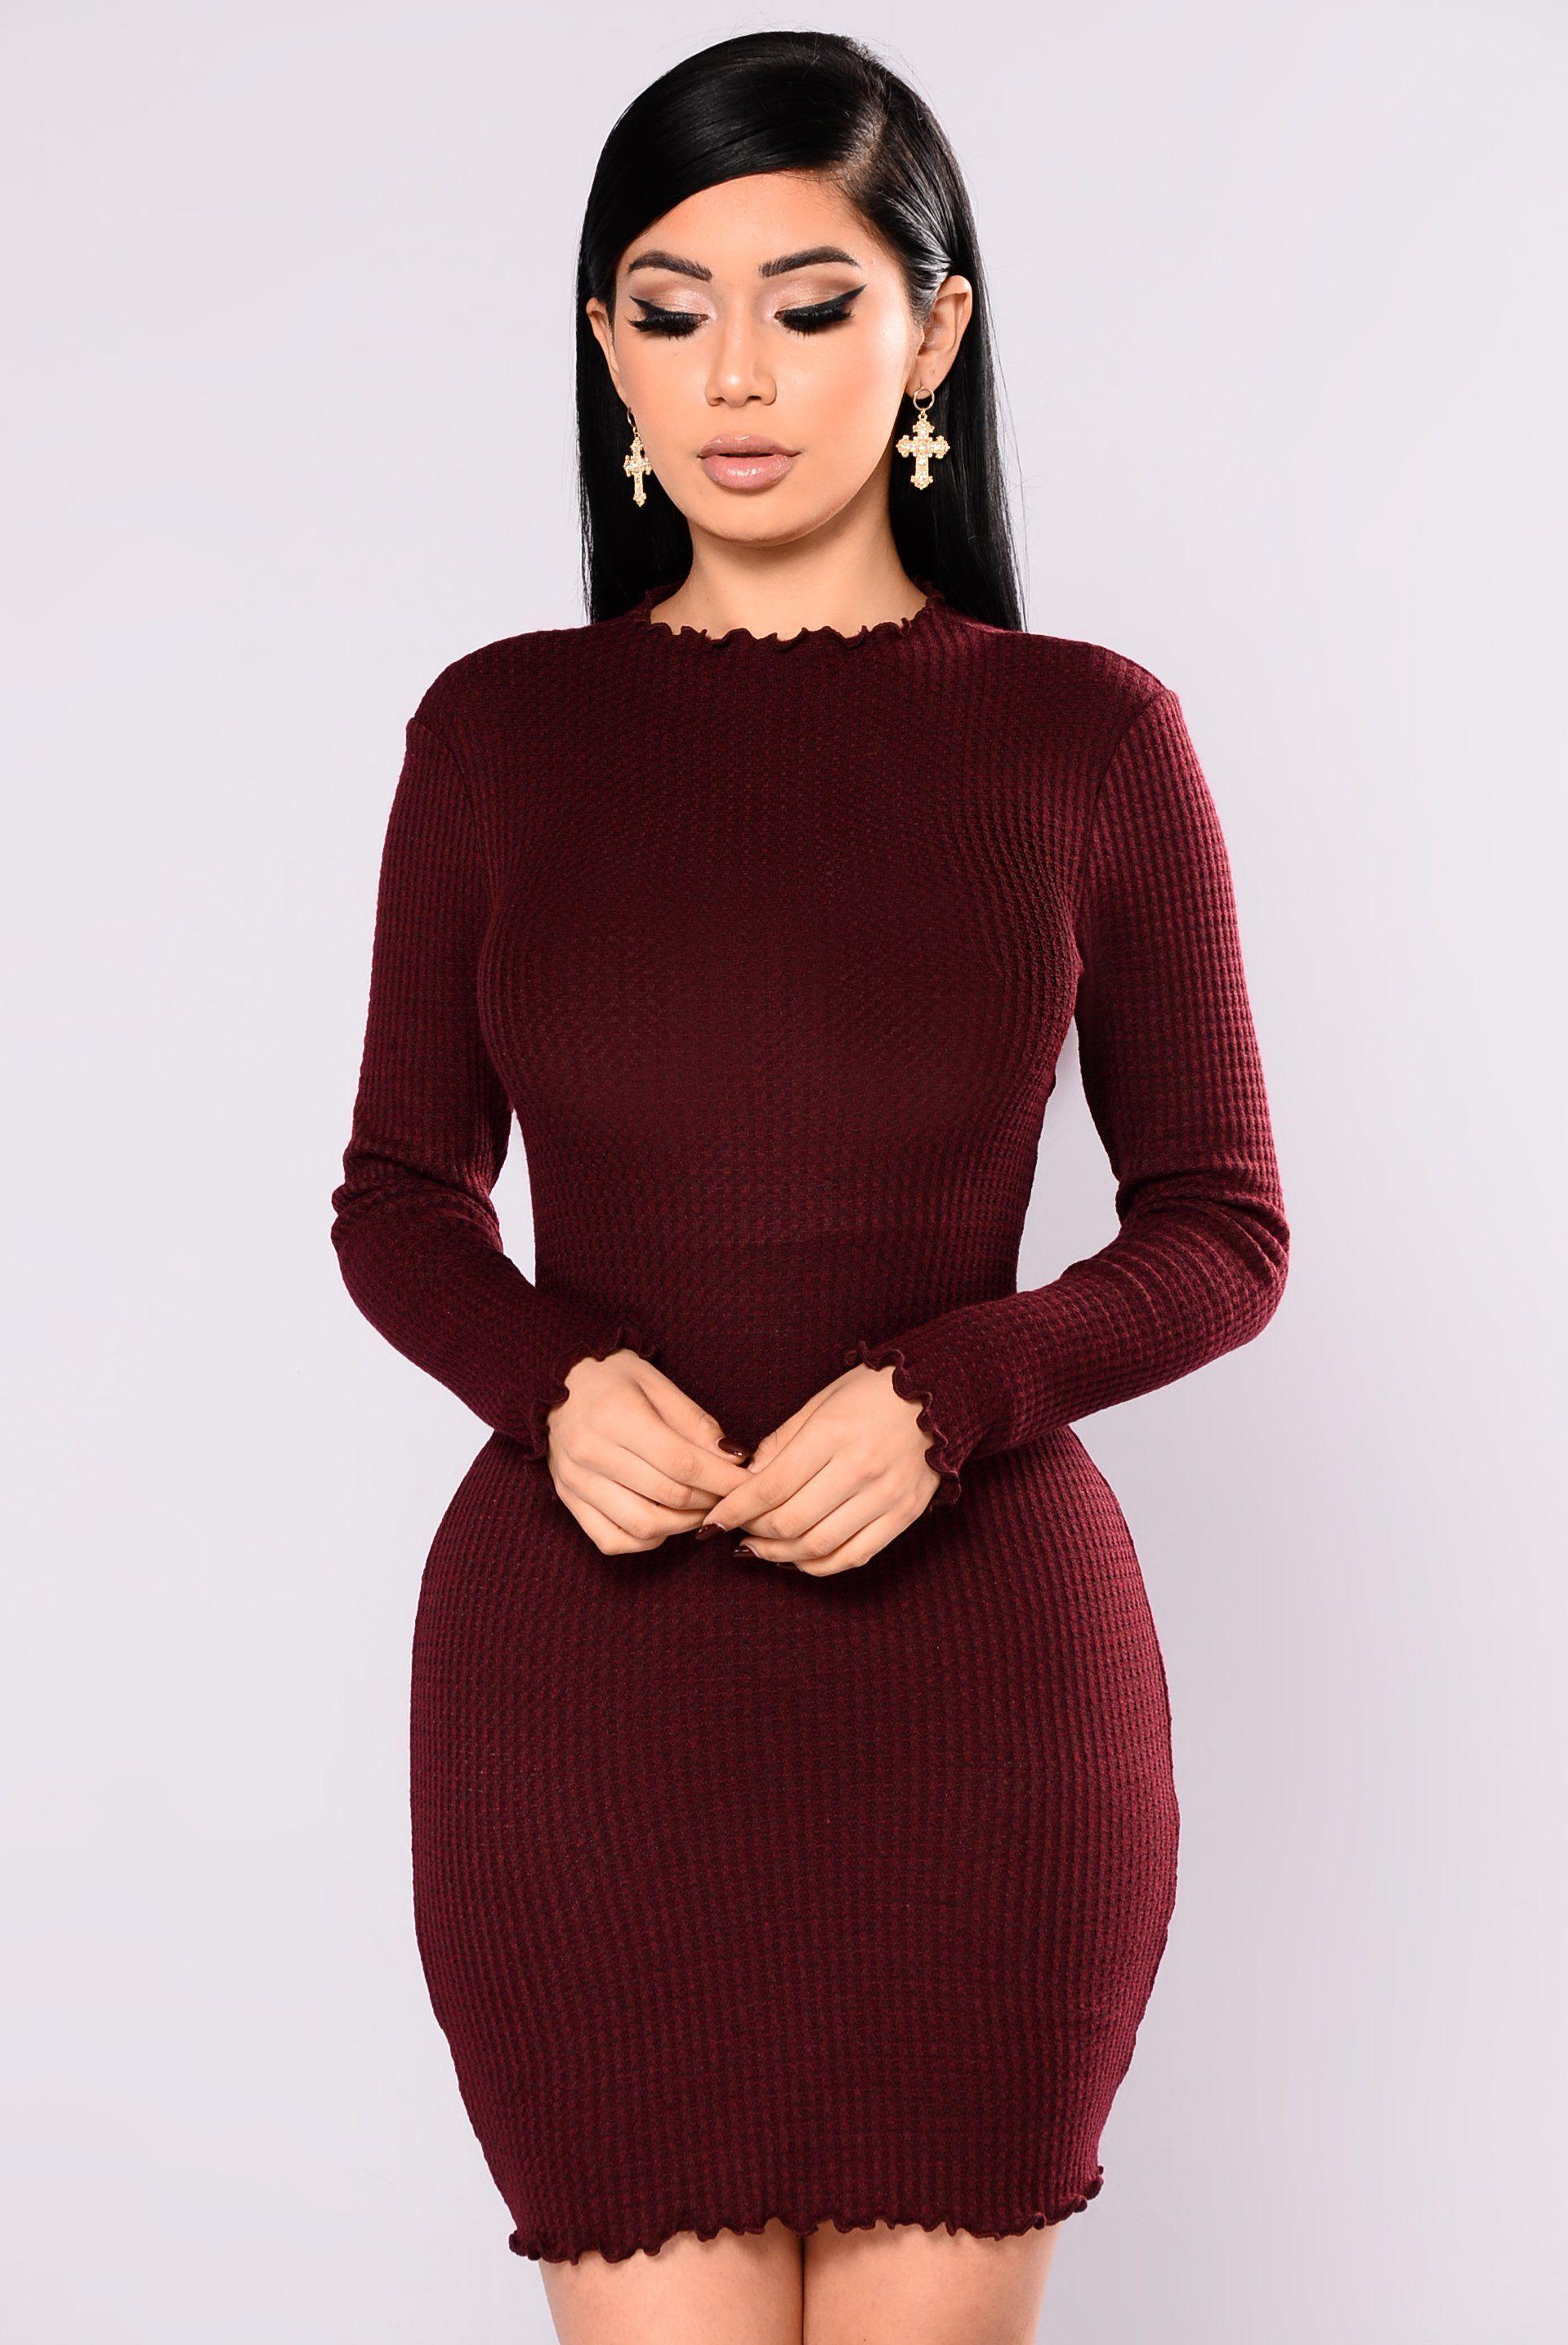 Feels So Good Knit Dress Burgundy Knit Dress Work Dresses For Women Dresses [ 2870 x 1919 Pixel ]